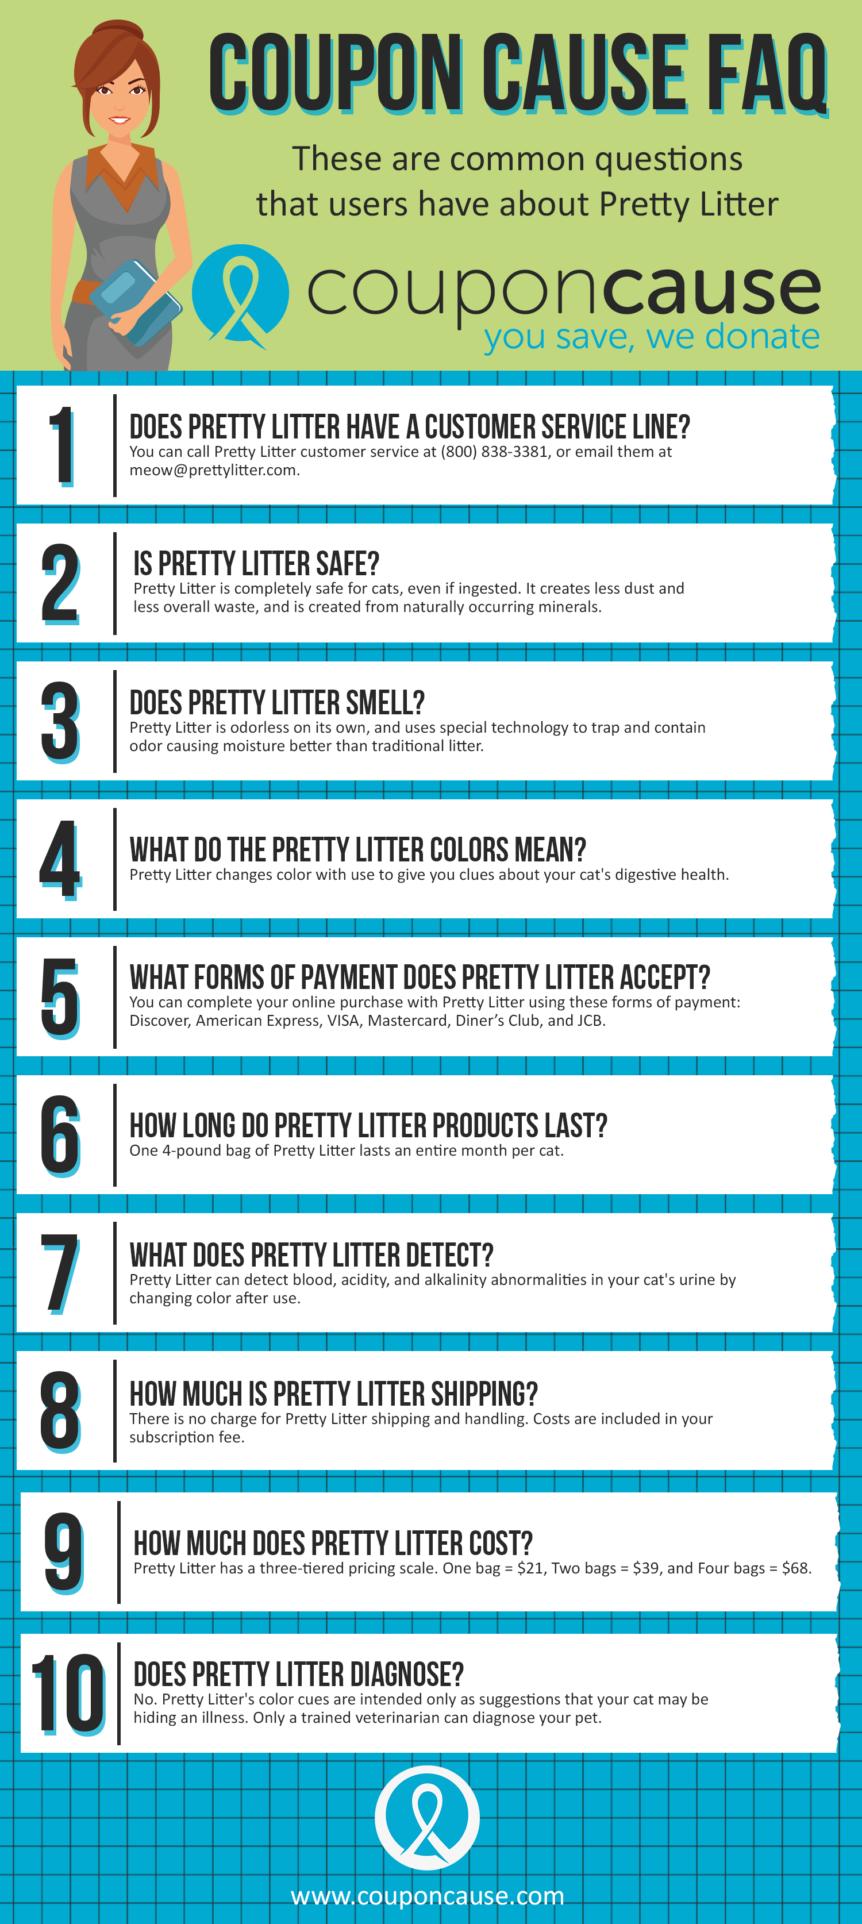 Pretty Litter Coupon Cause FAQ (C.C. FAQ)